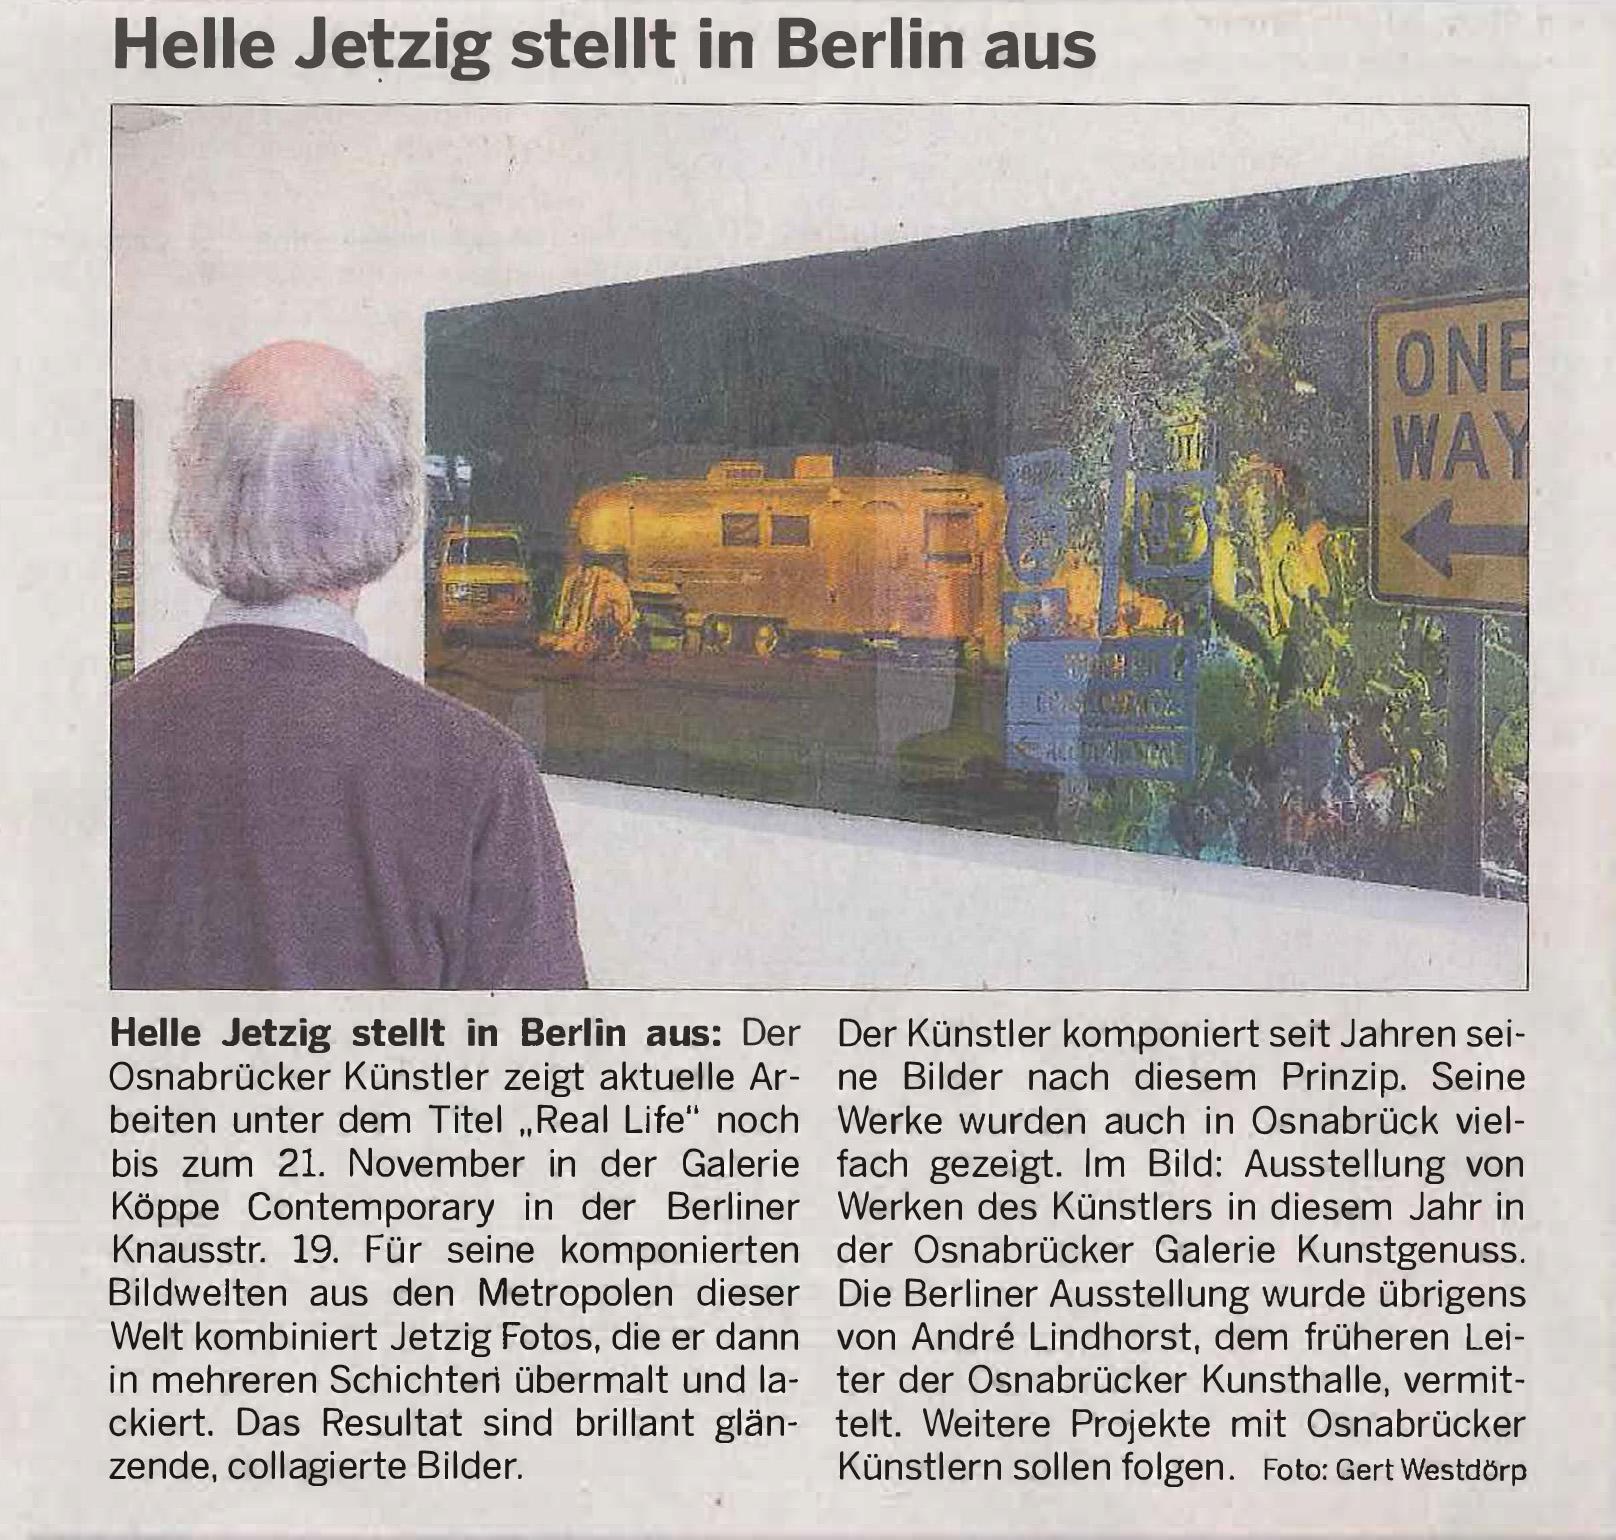 Neue Osnabrücker Zeitung - Helle Jetzig